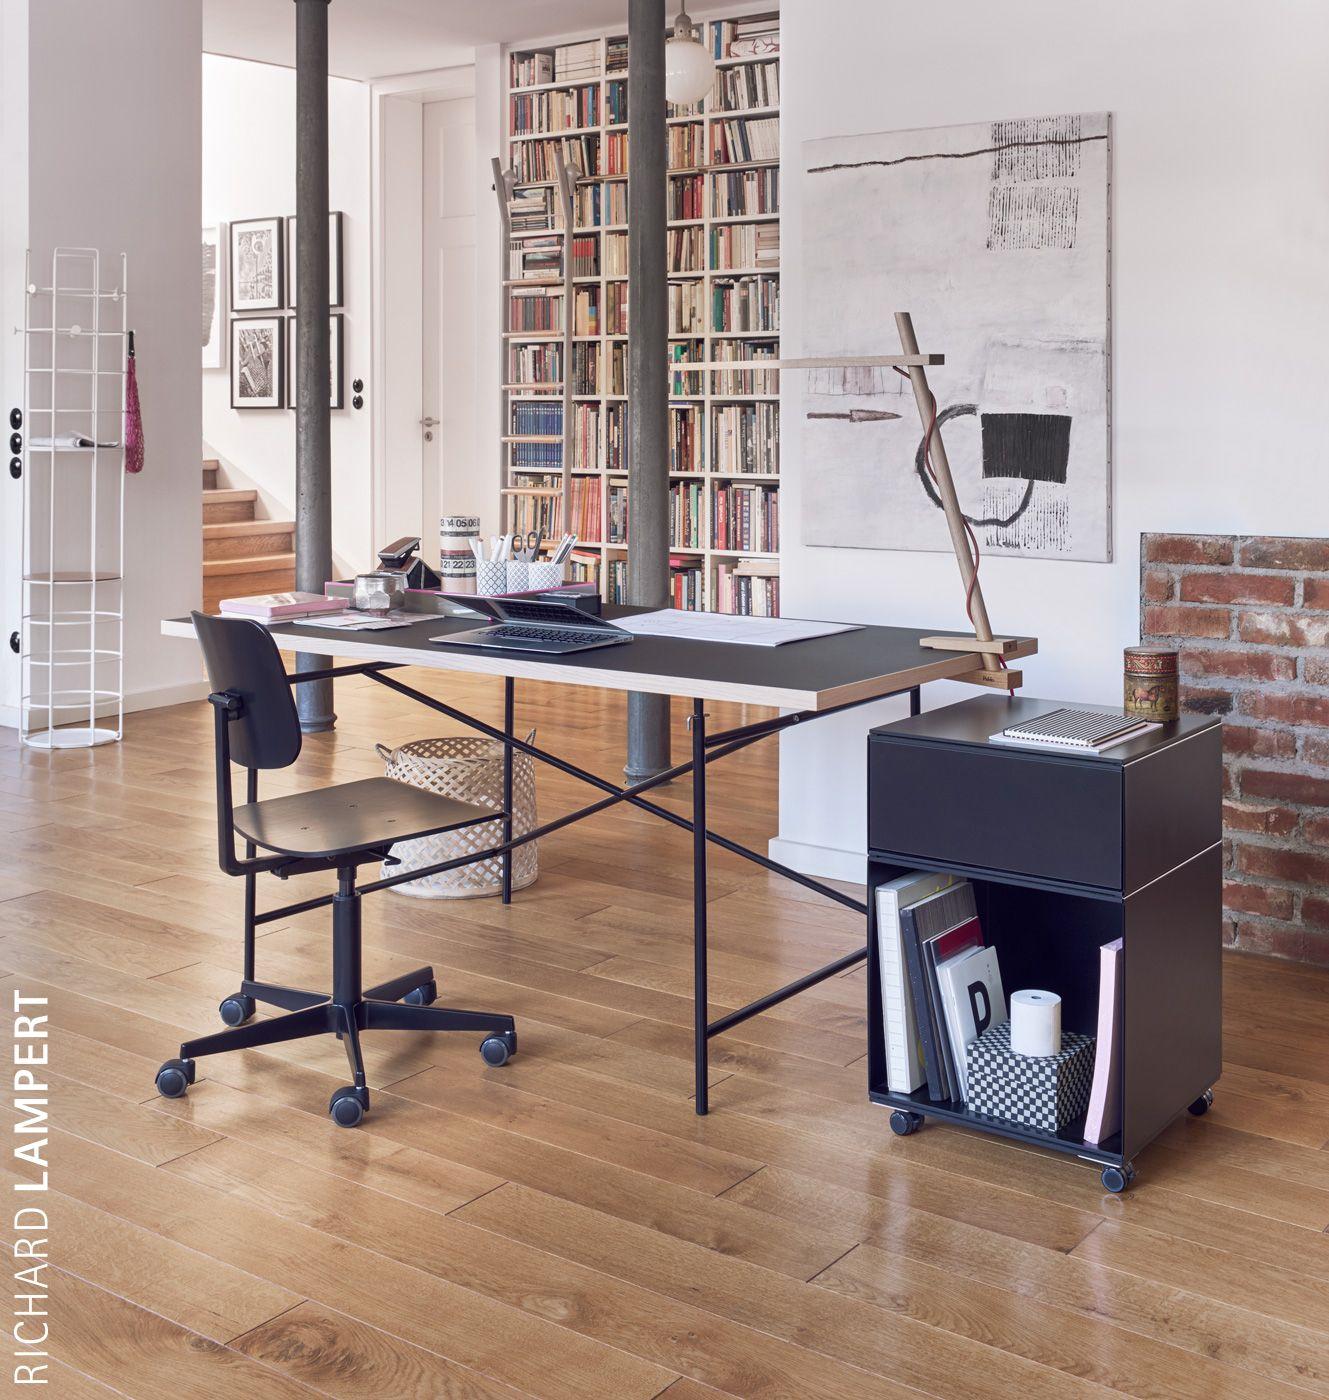 Homeoffice Furniture Design: Unique And Versatile: The Original 1953 Frame Design By